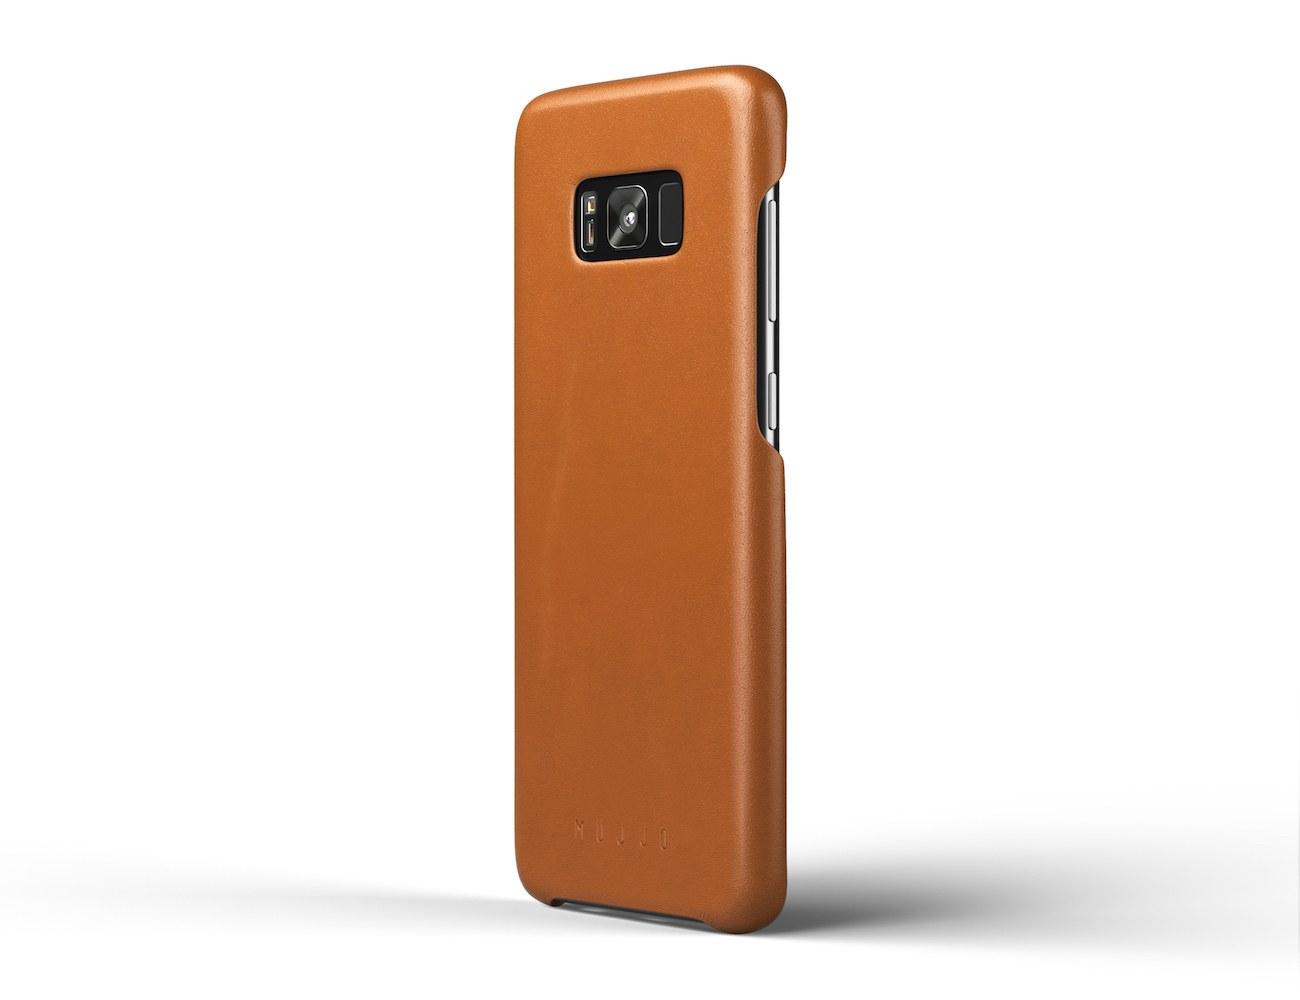 Samsung Galaxy S8 Premium Leather Case by MUJJO